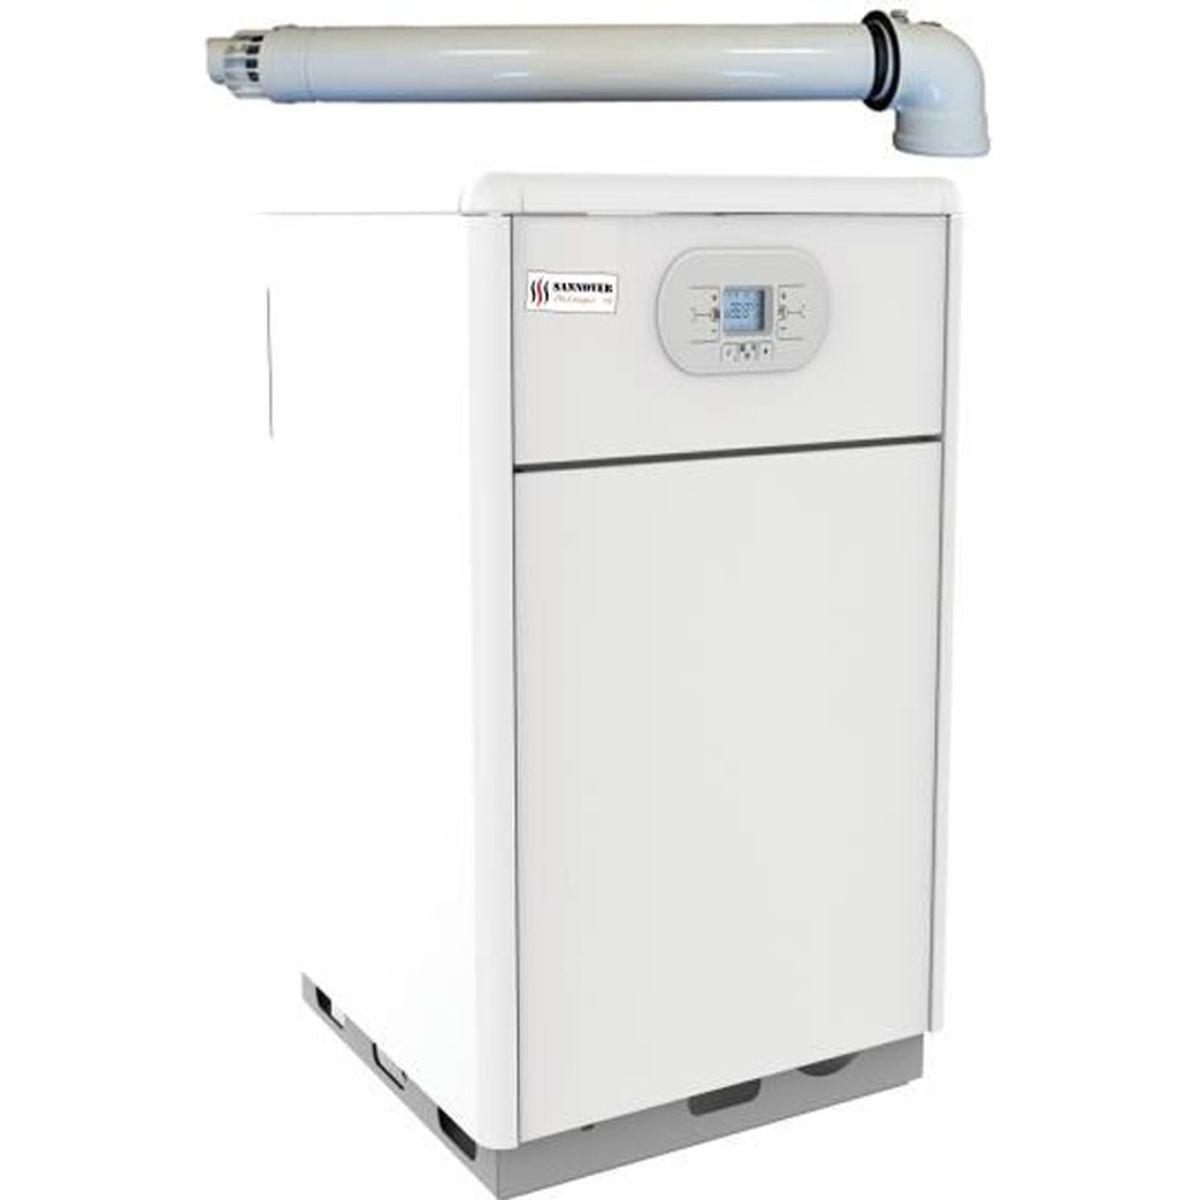 Chaudière Gaz Sol Condensation SunCondens Sannover 10 kW Chauffage Seul